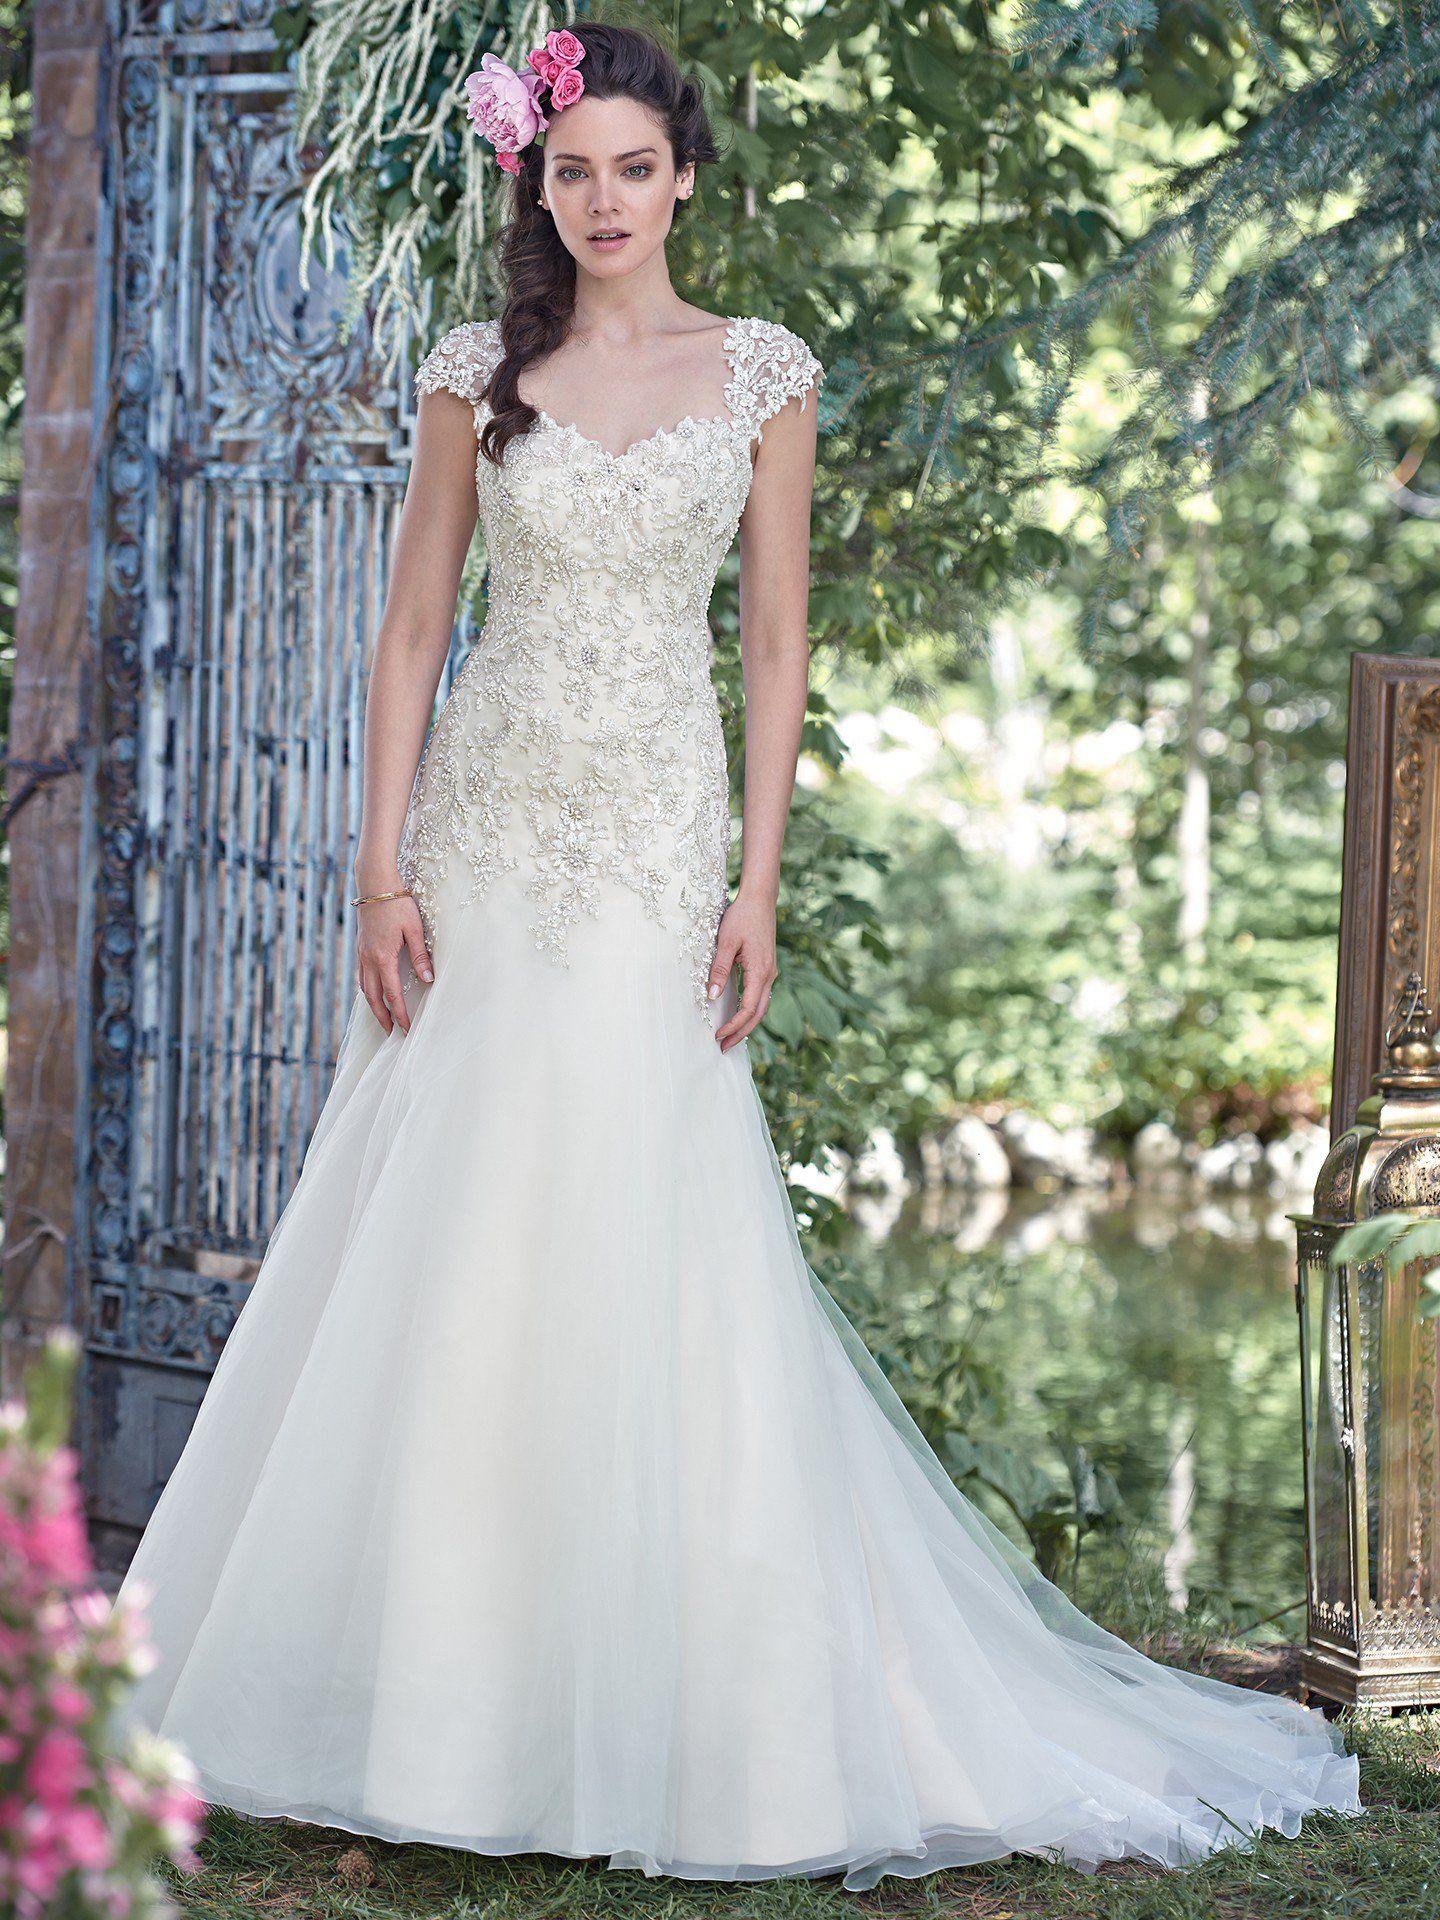 Bridal Dresses Brisbane North Dacc